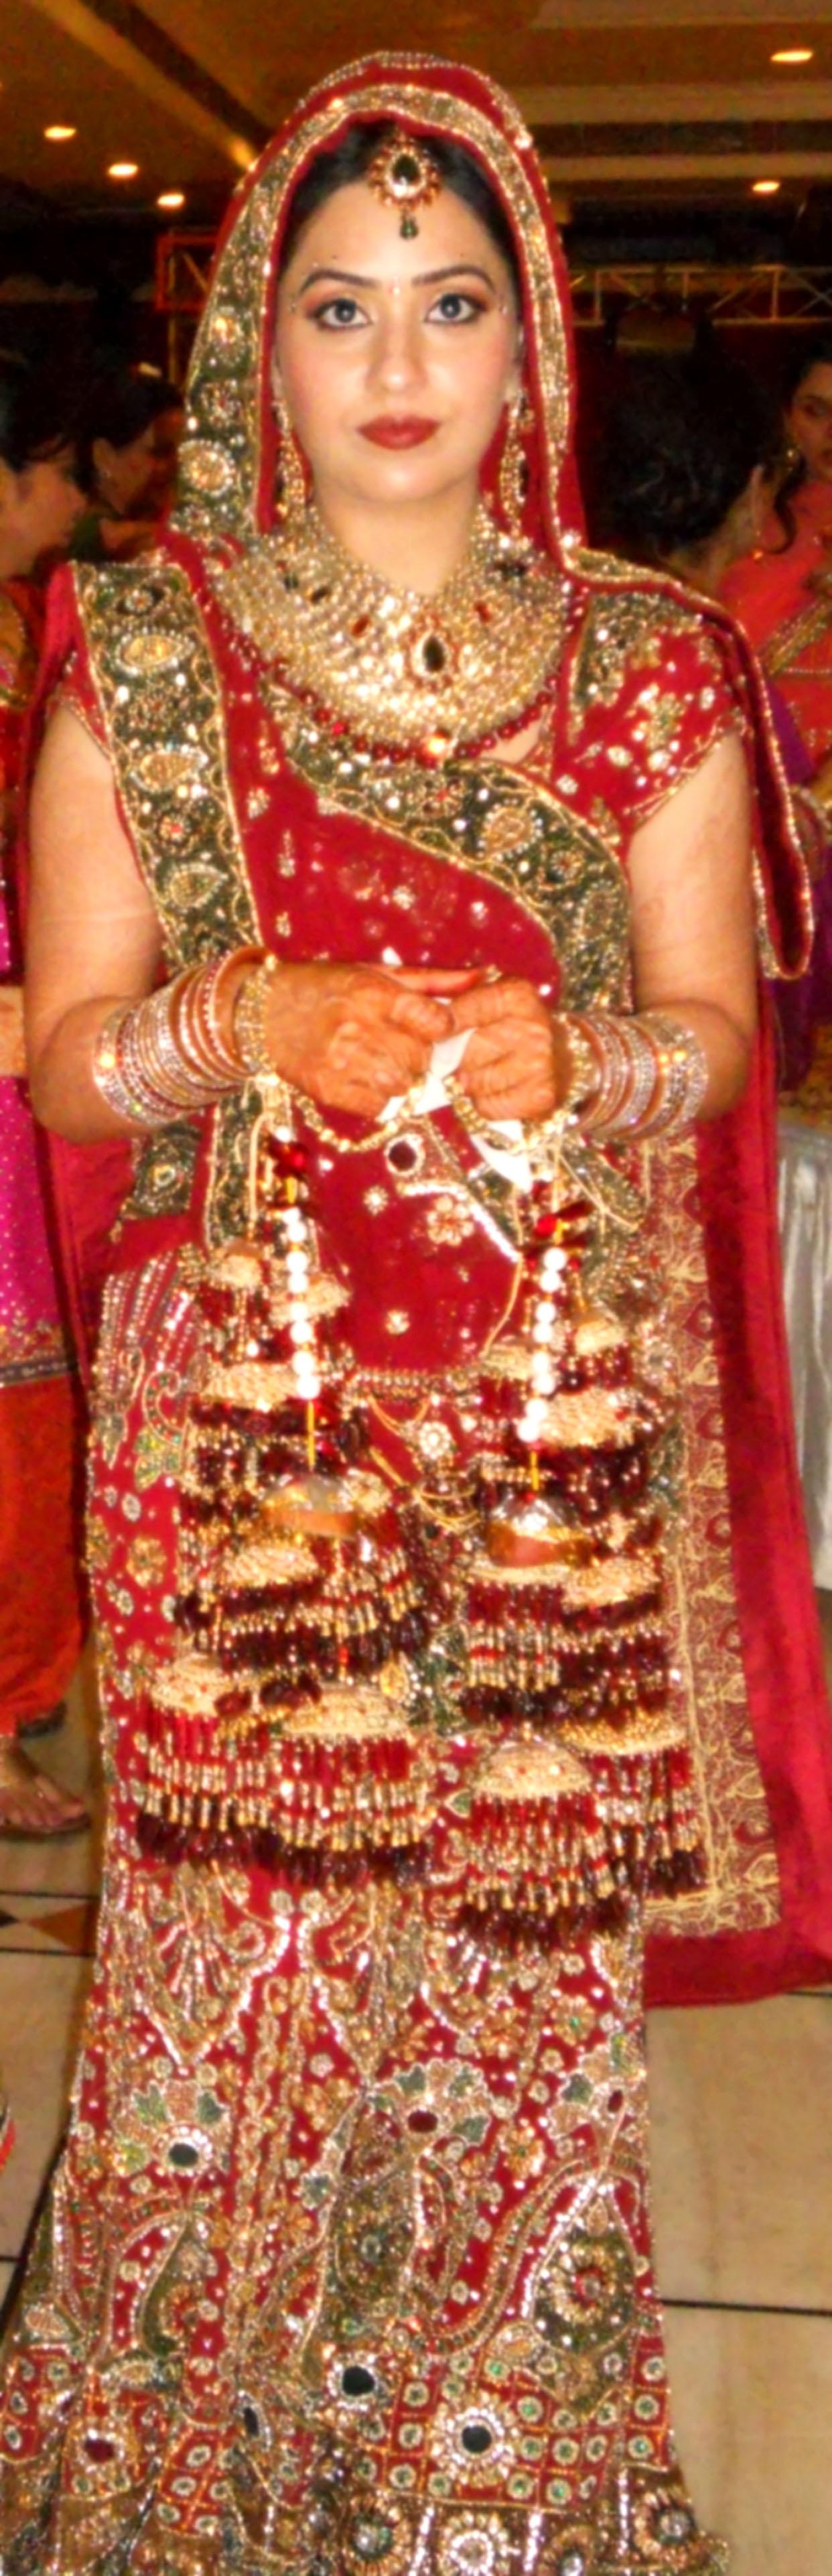 Punjabi Wedding Dresses for Women Appreciate great quotes